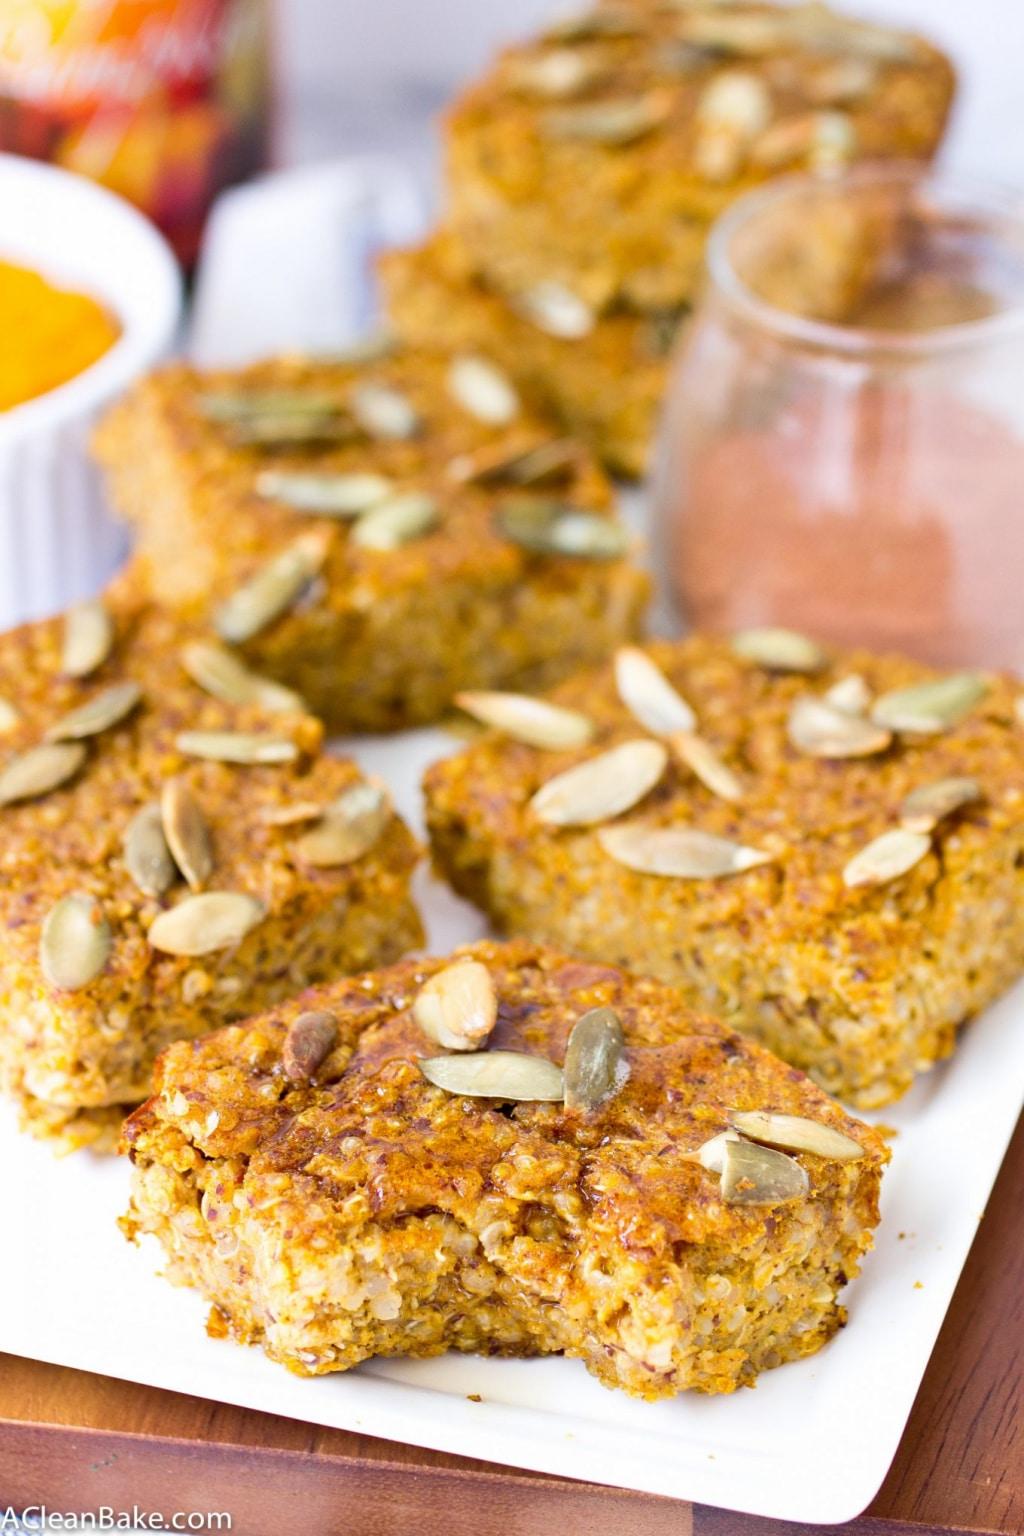 Pumpkin Baked Quinoa Bars (gluten free, whole grain, and vegan)